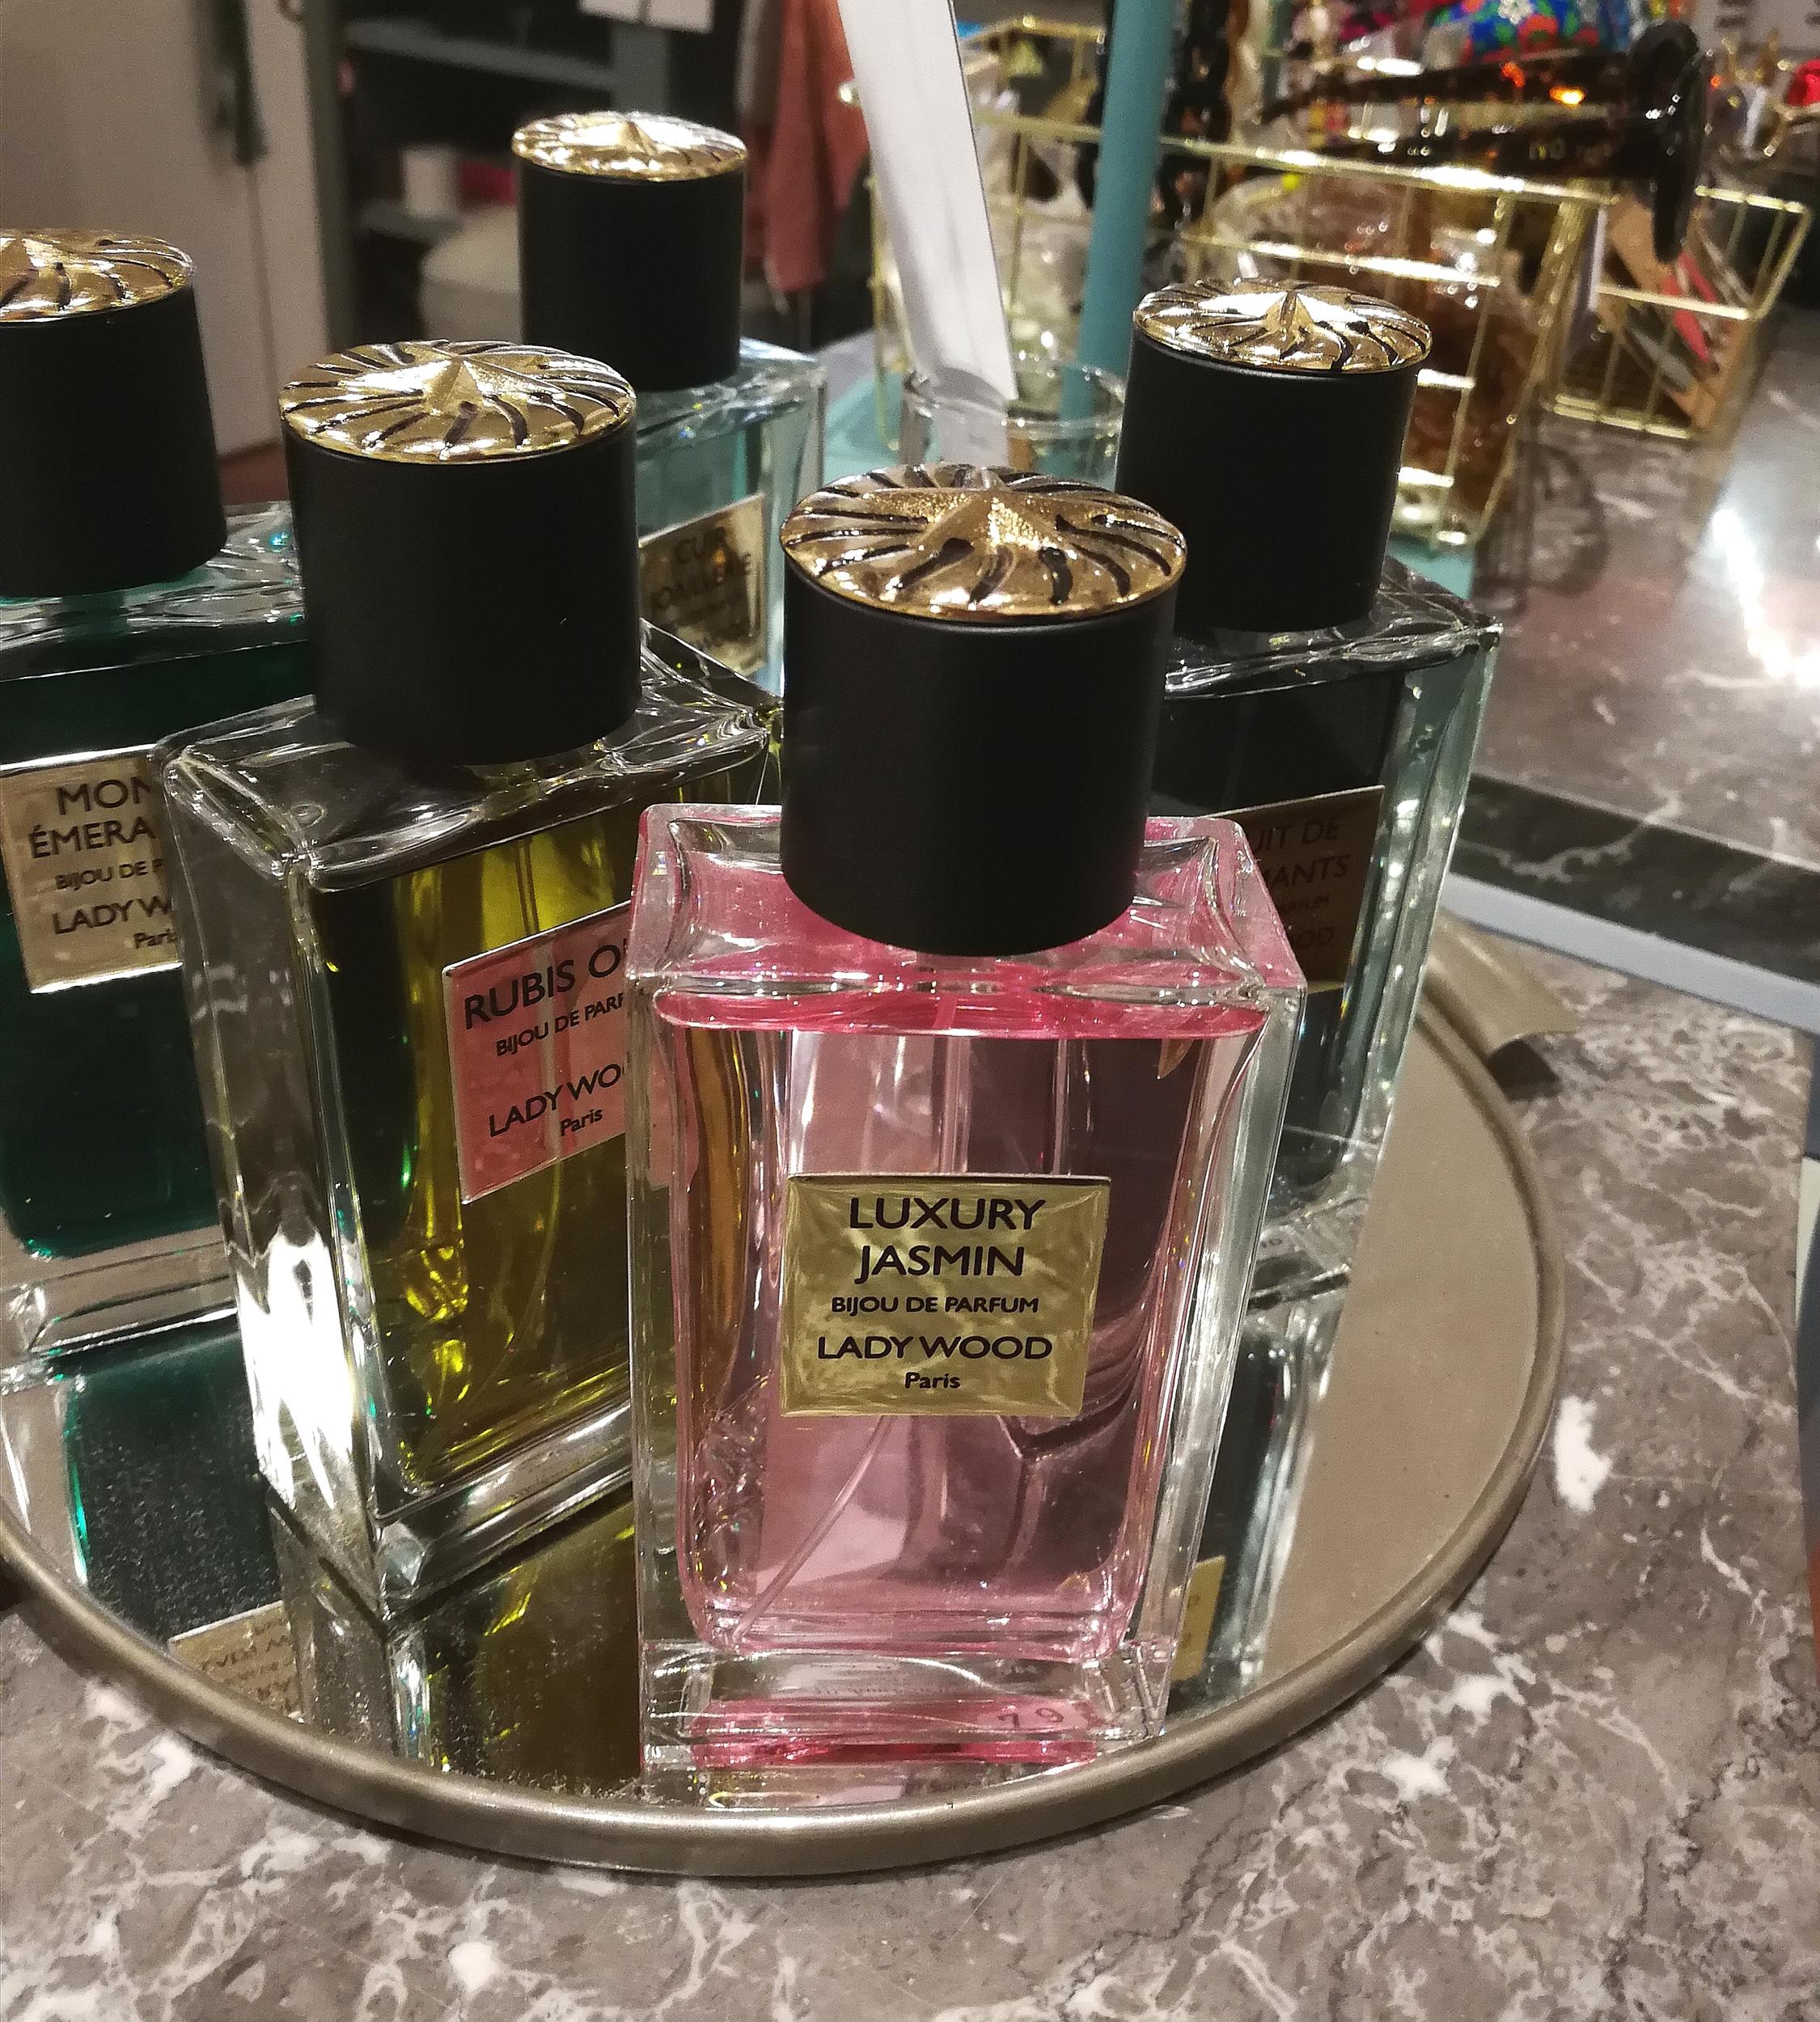 Parfum Luxury Jasmin